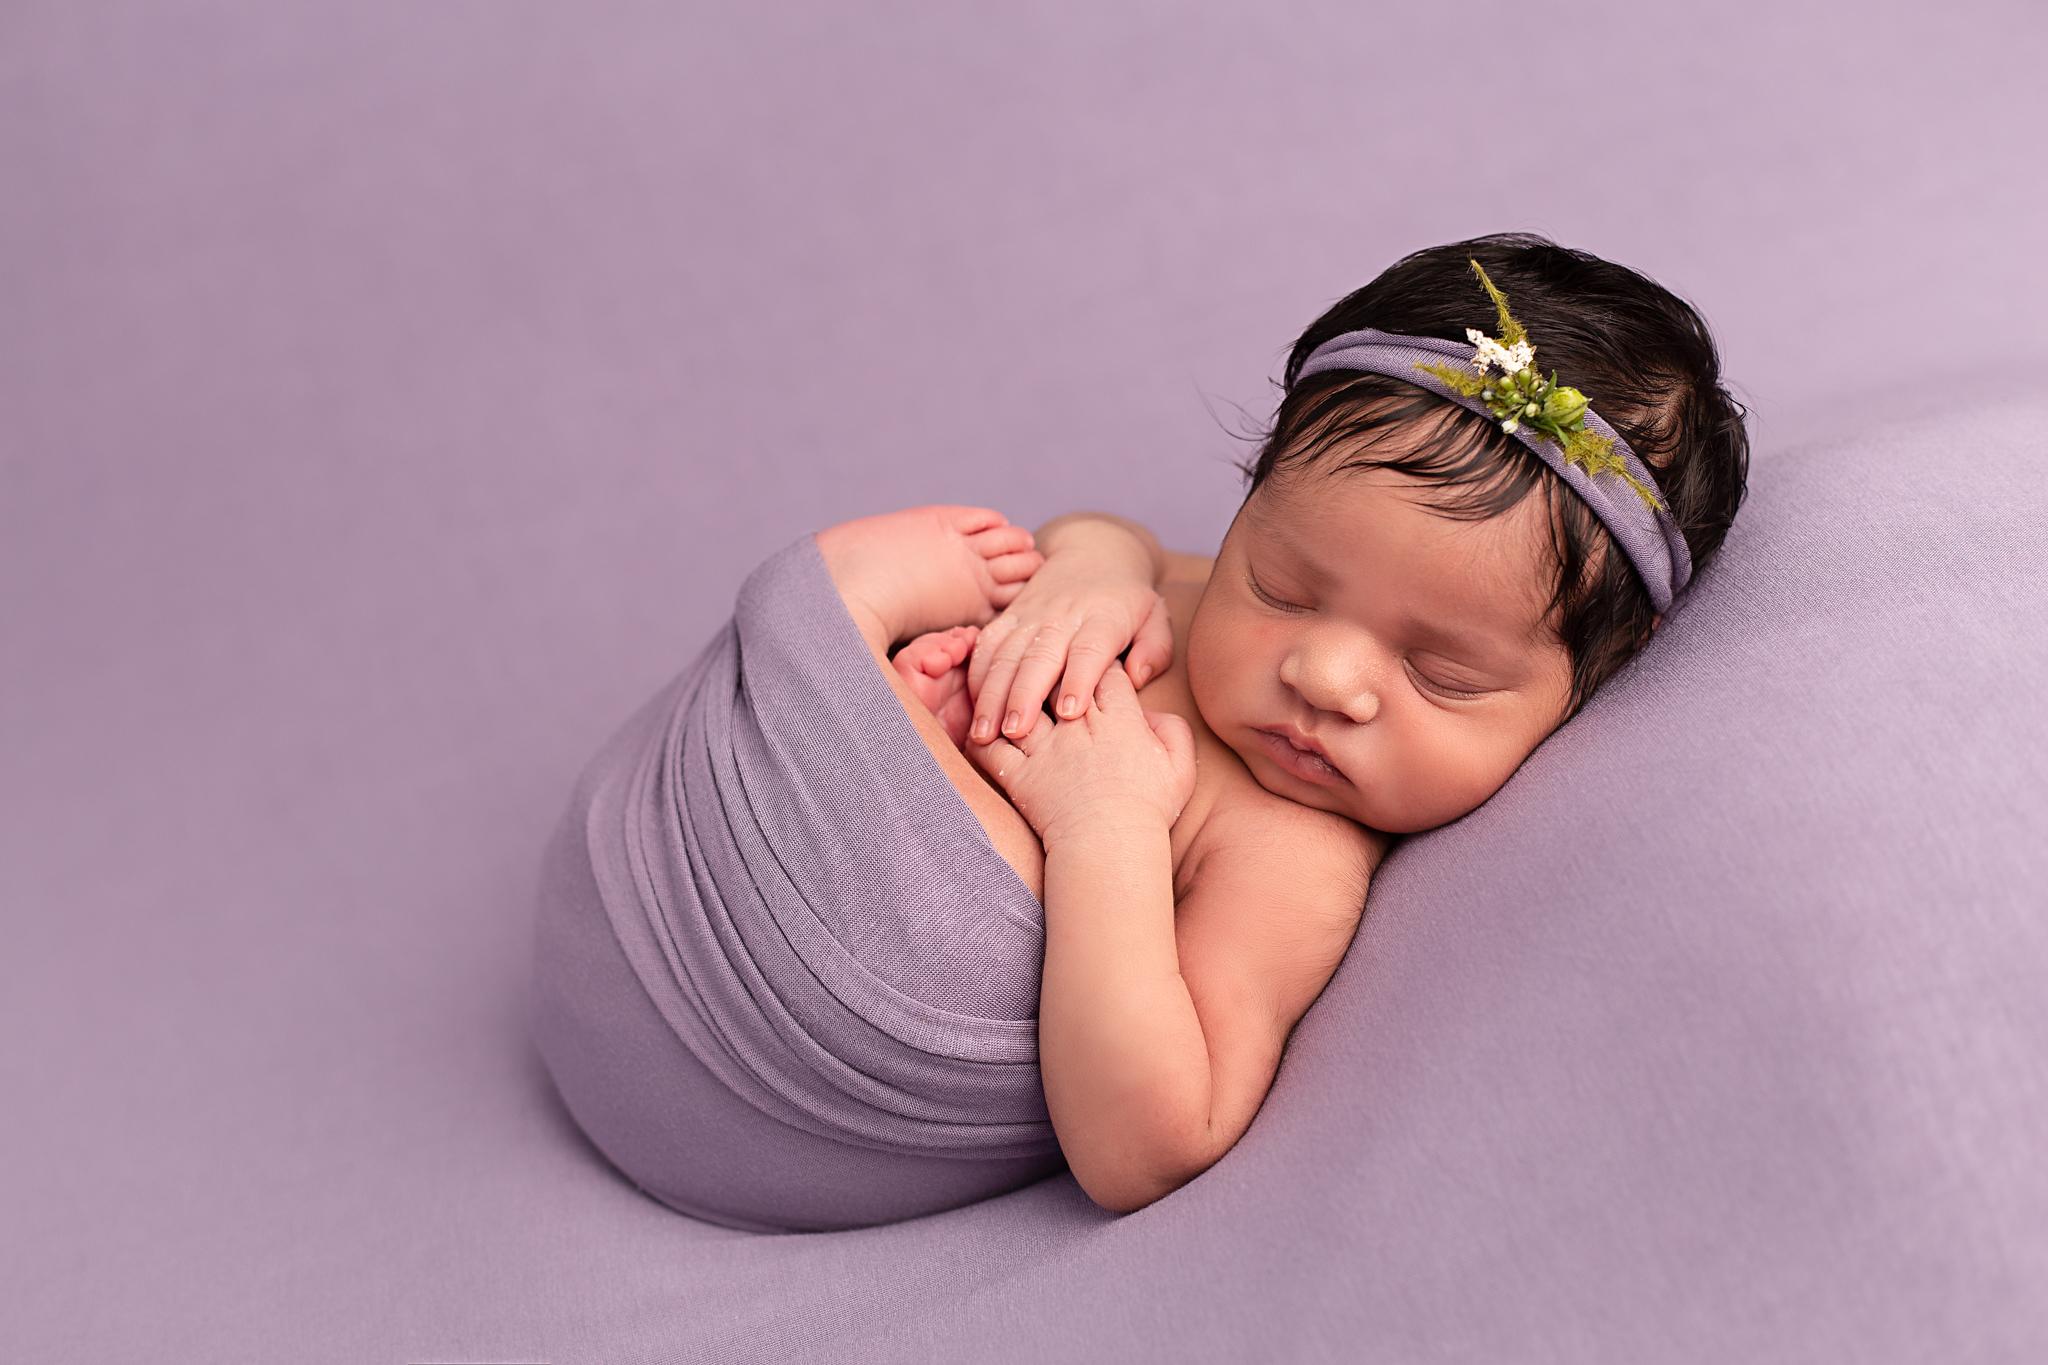 newborn photo on purple